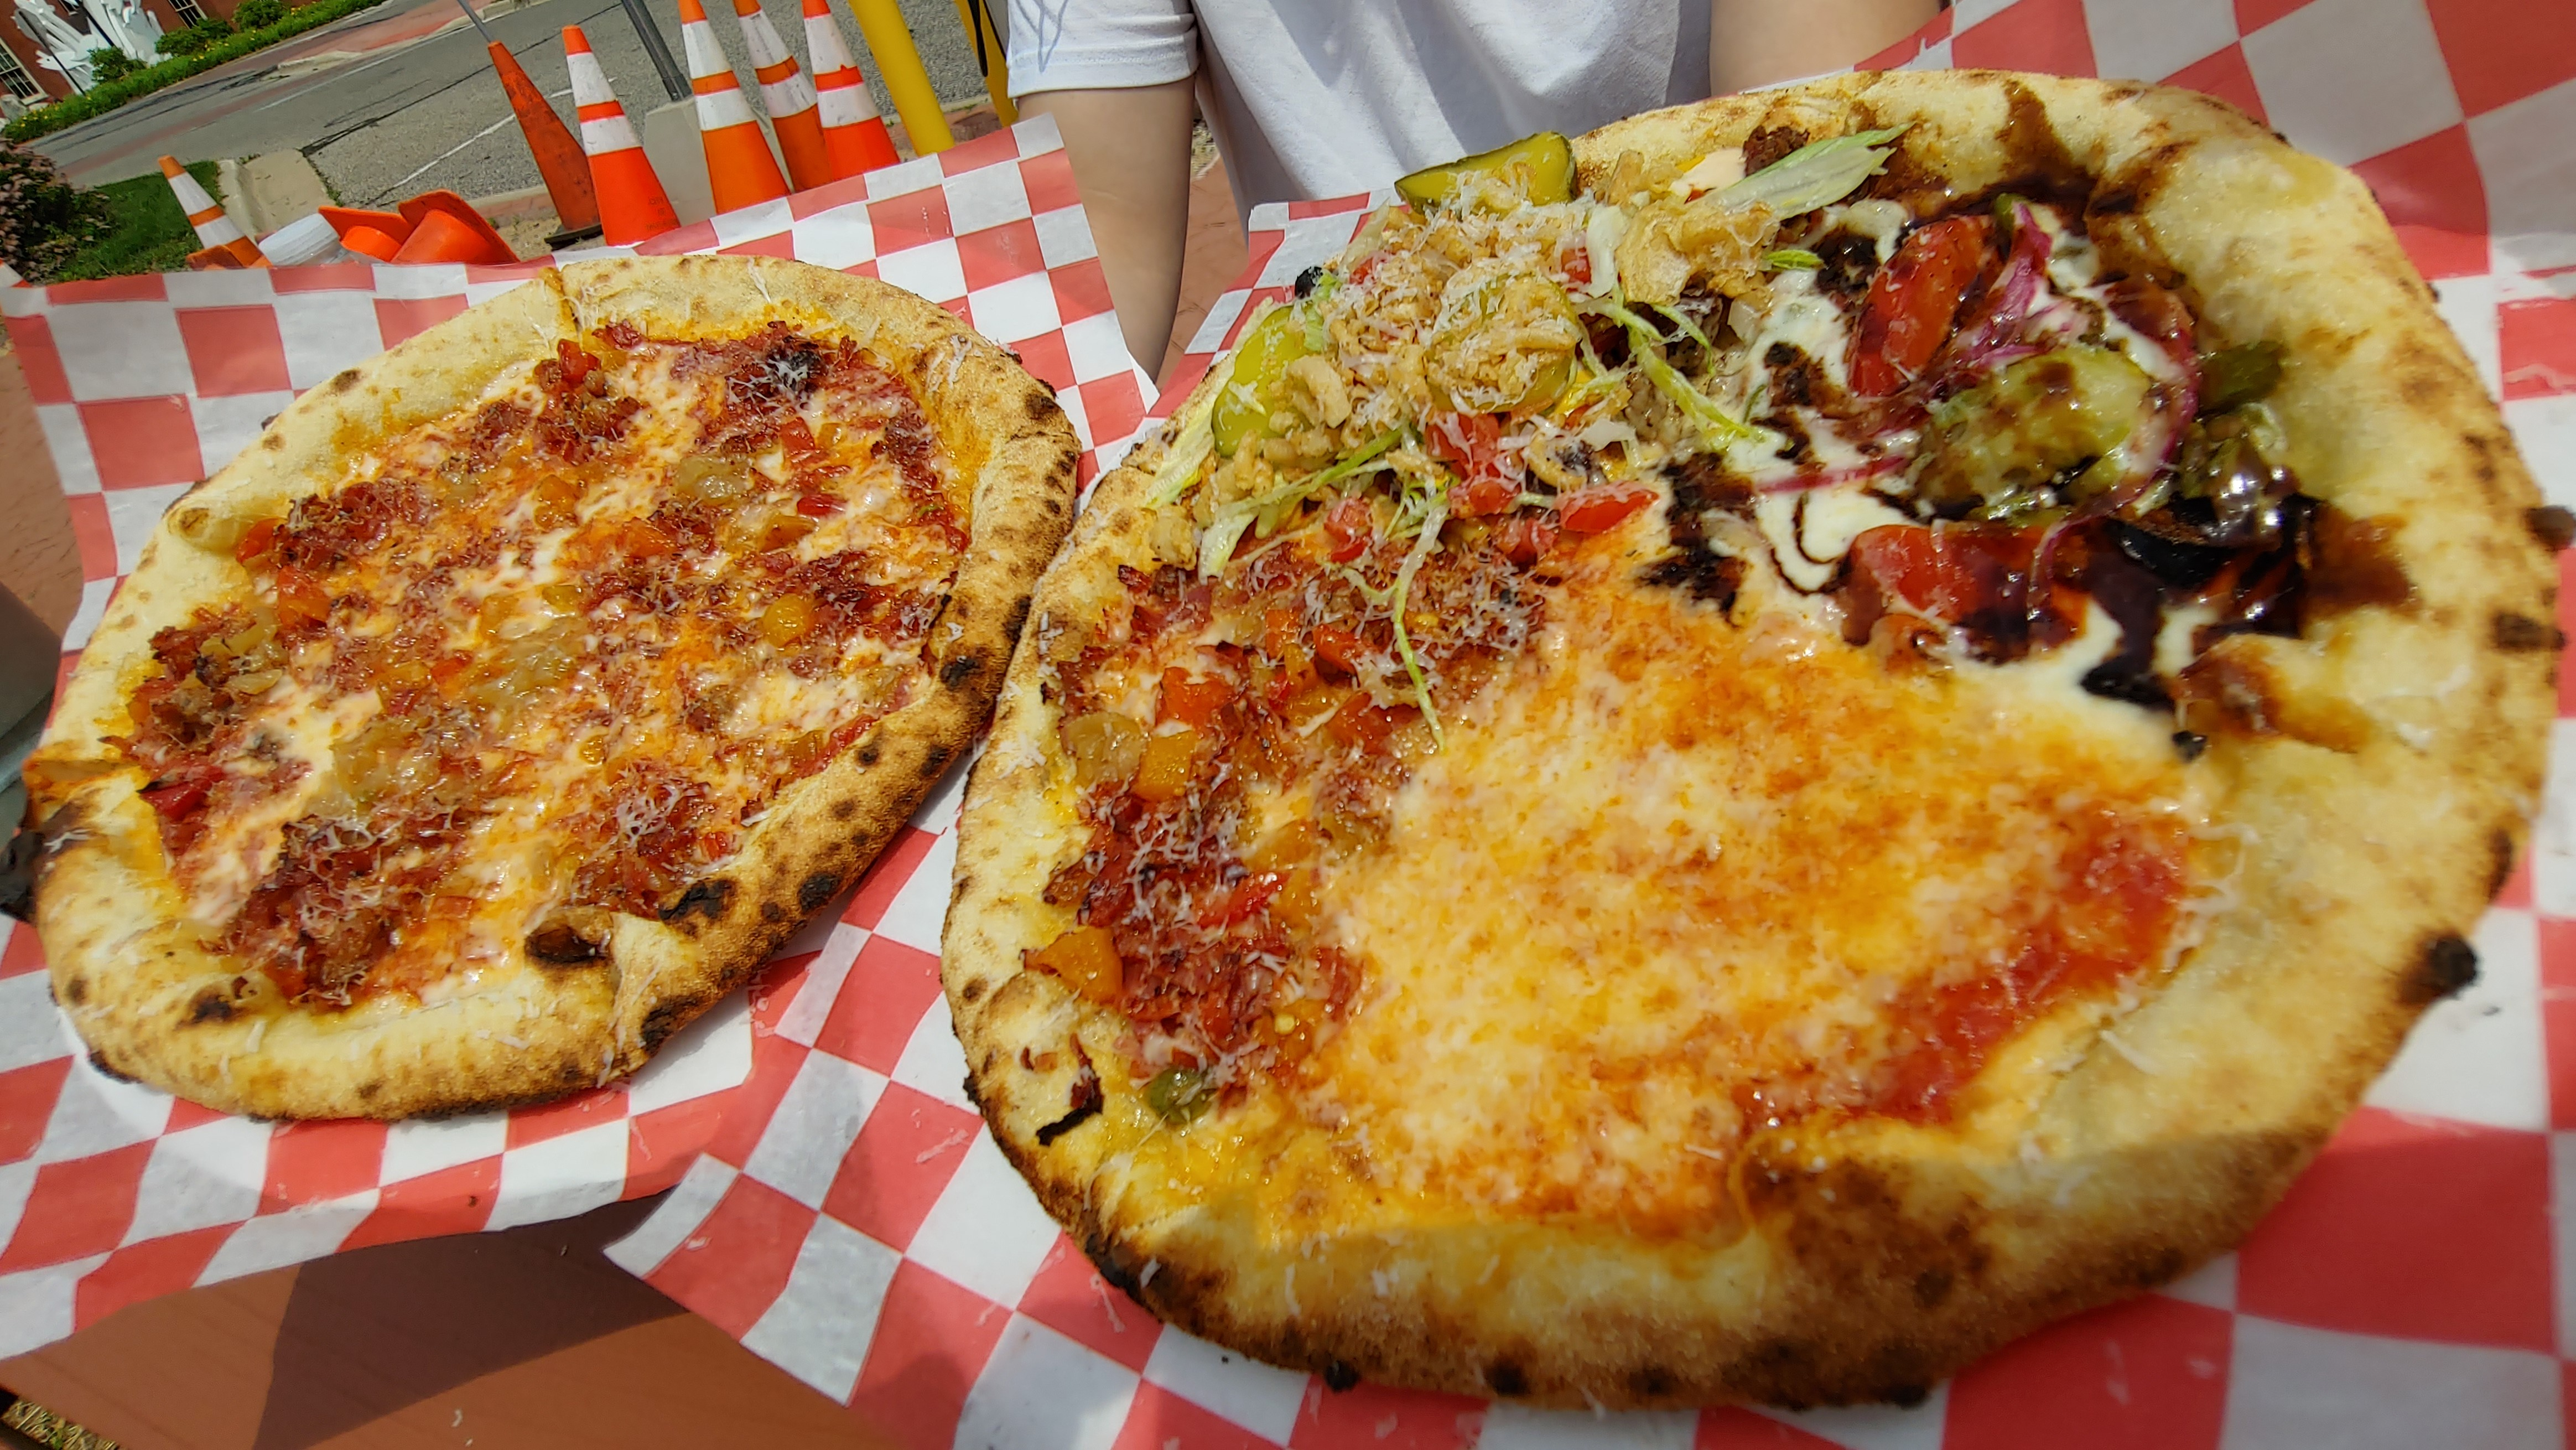 Best Pizza Restaurants in Downtown Muskegon